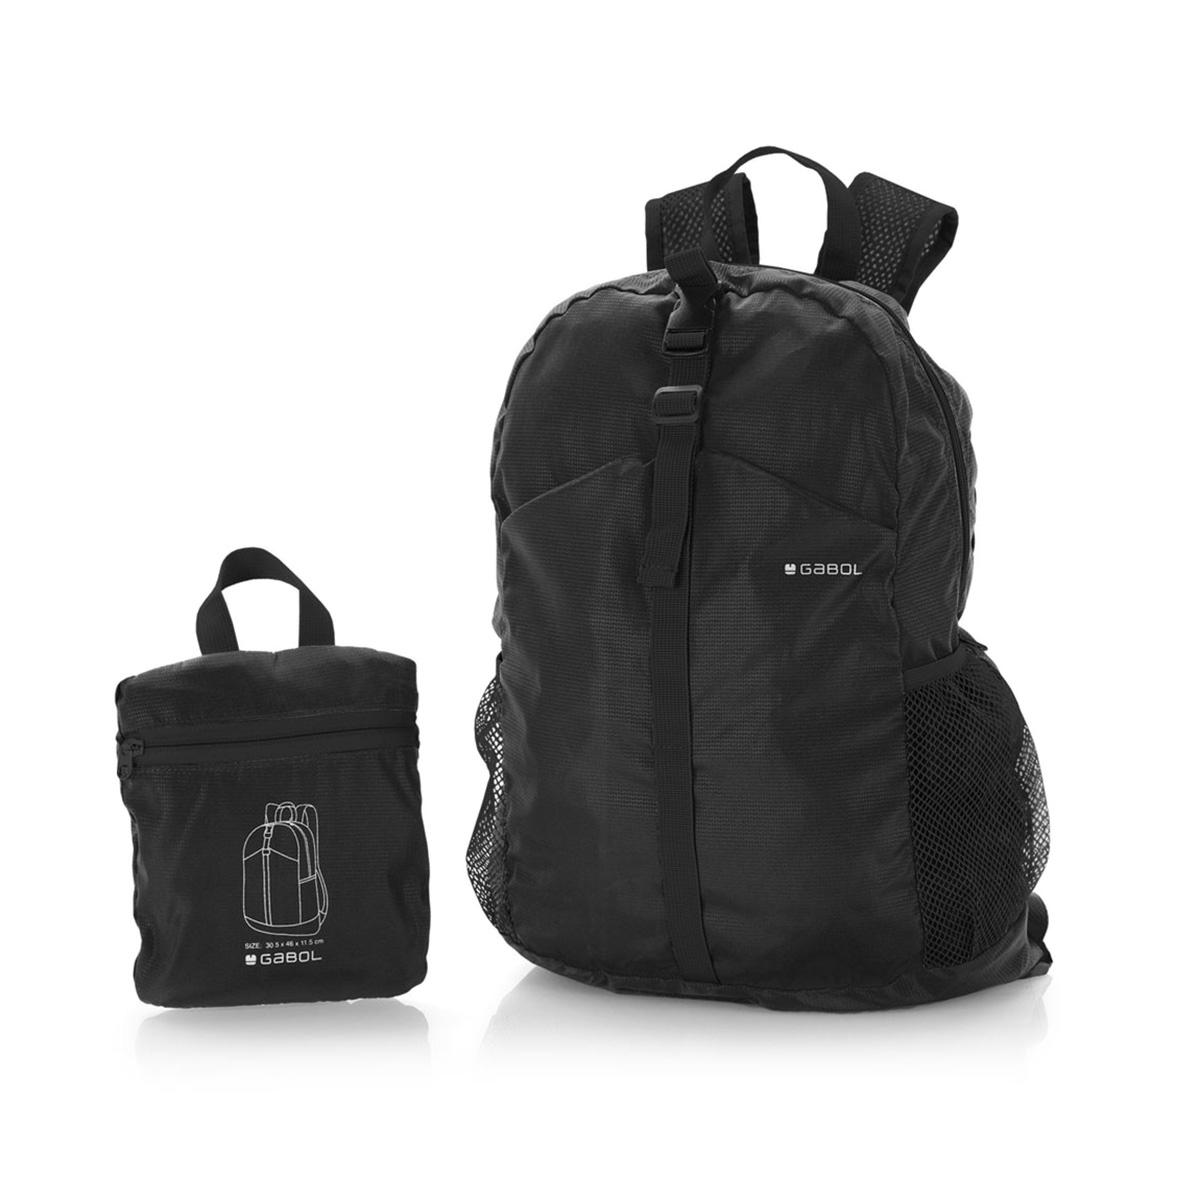 8f2e81f80c Σακίδιο Πλάτης Ταξιδιού Αναδιπλούμενο Gabol Foldable Backpack 800030 ...